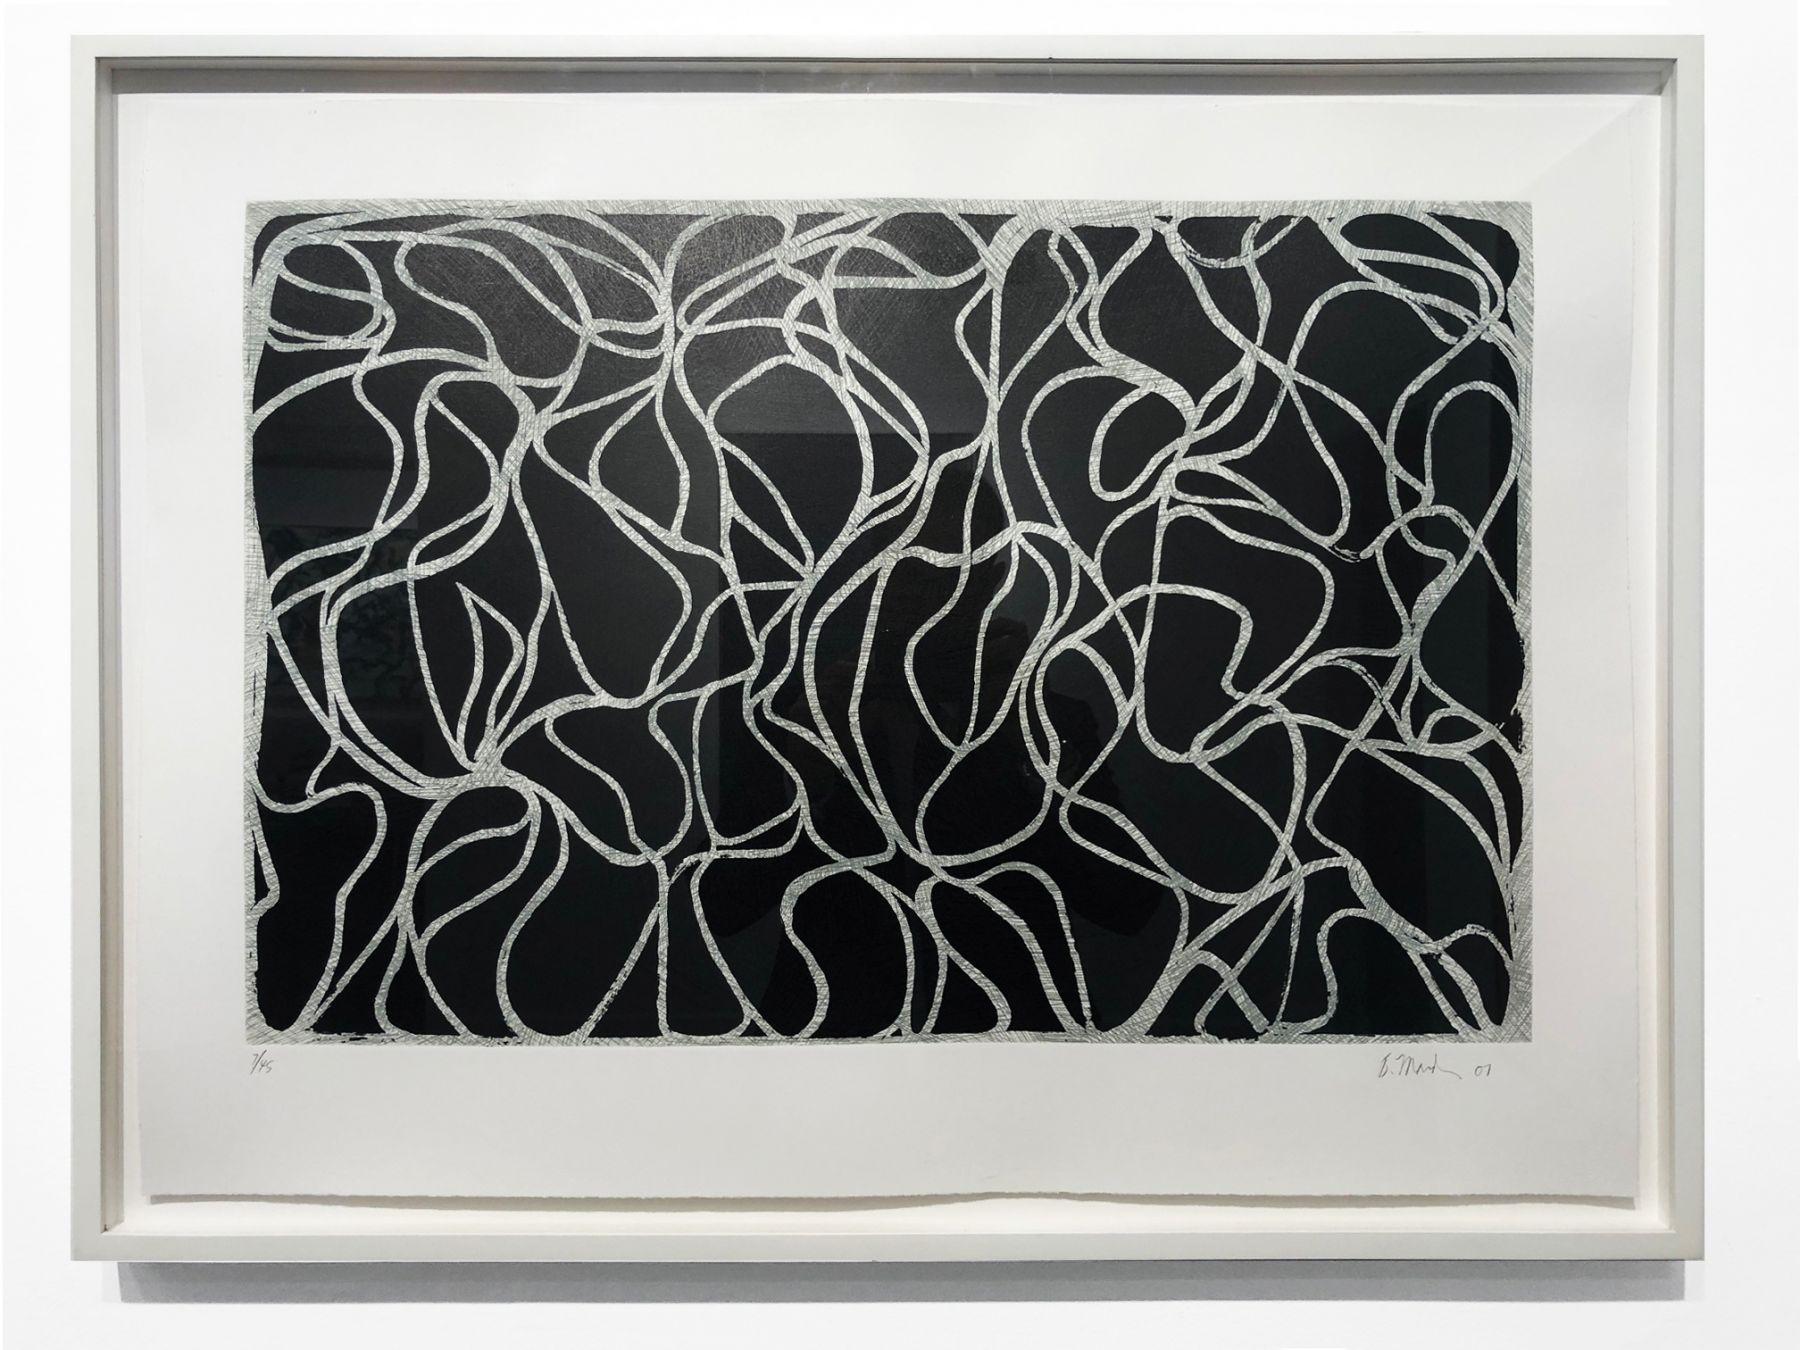 Brice Marden, Line Muses, 2001